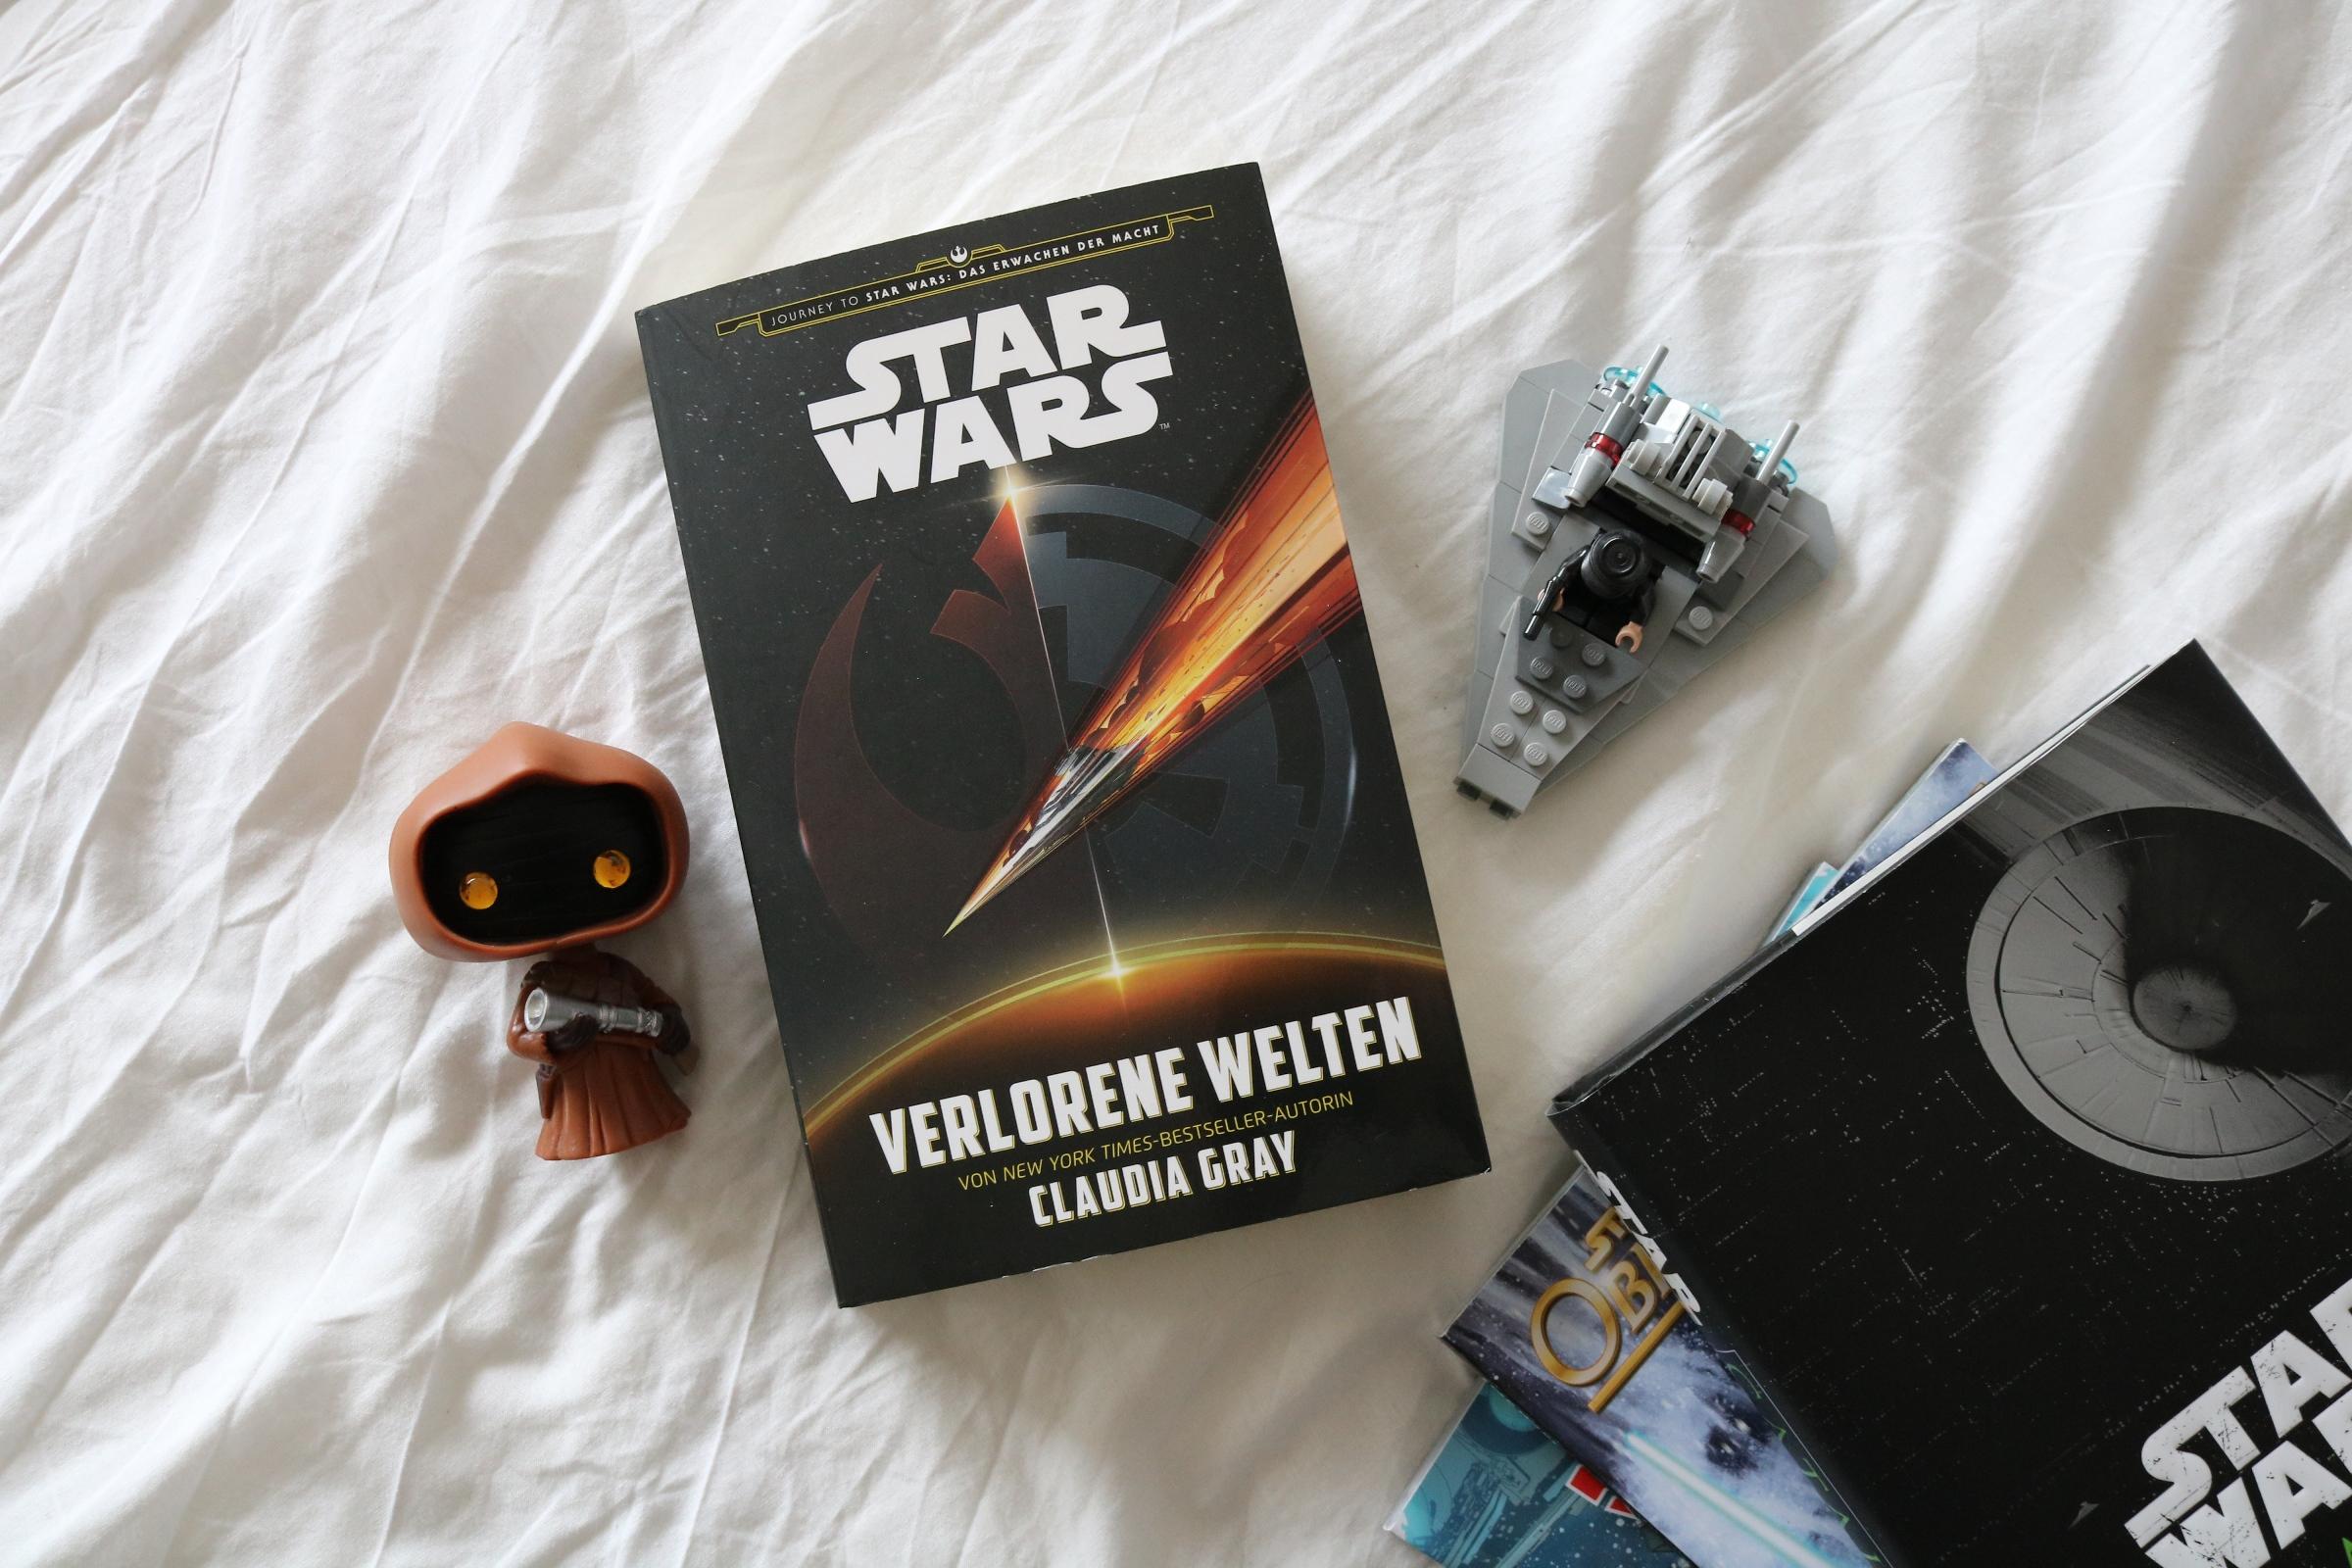 Star Wars: Verlorene Welten - Claudia Gray